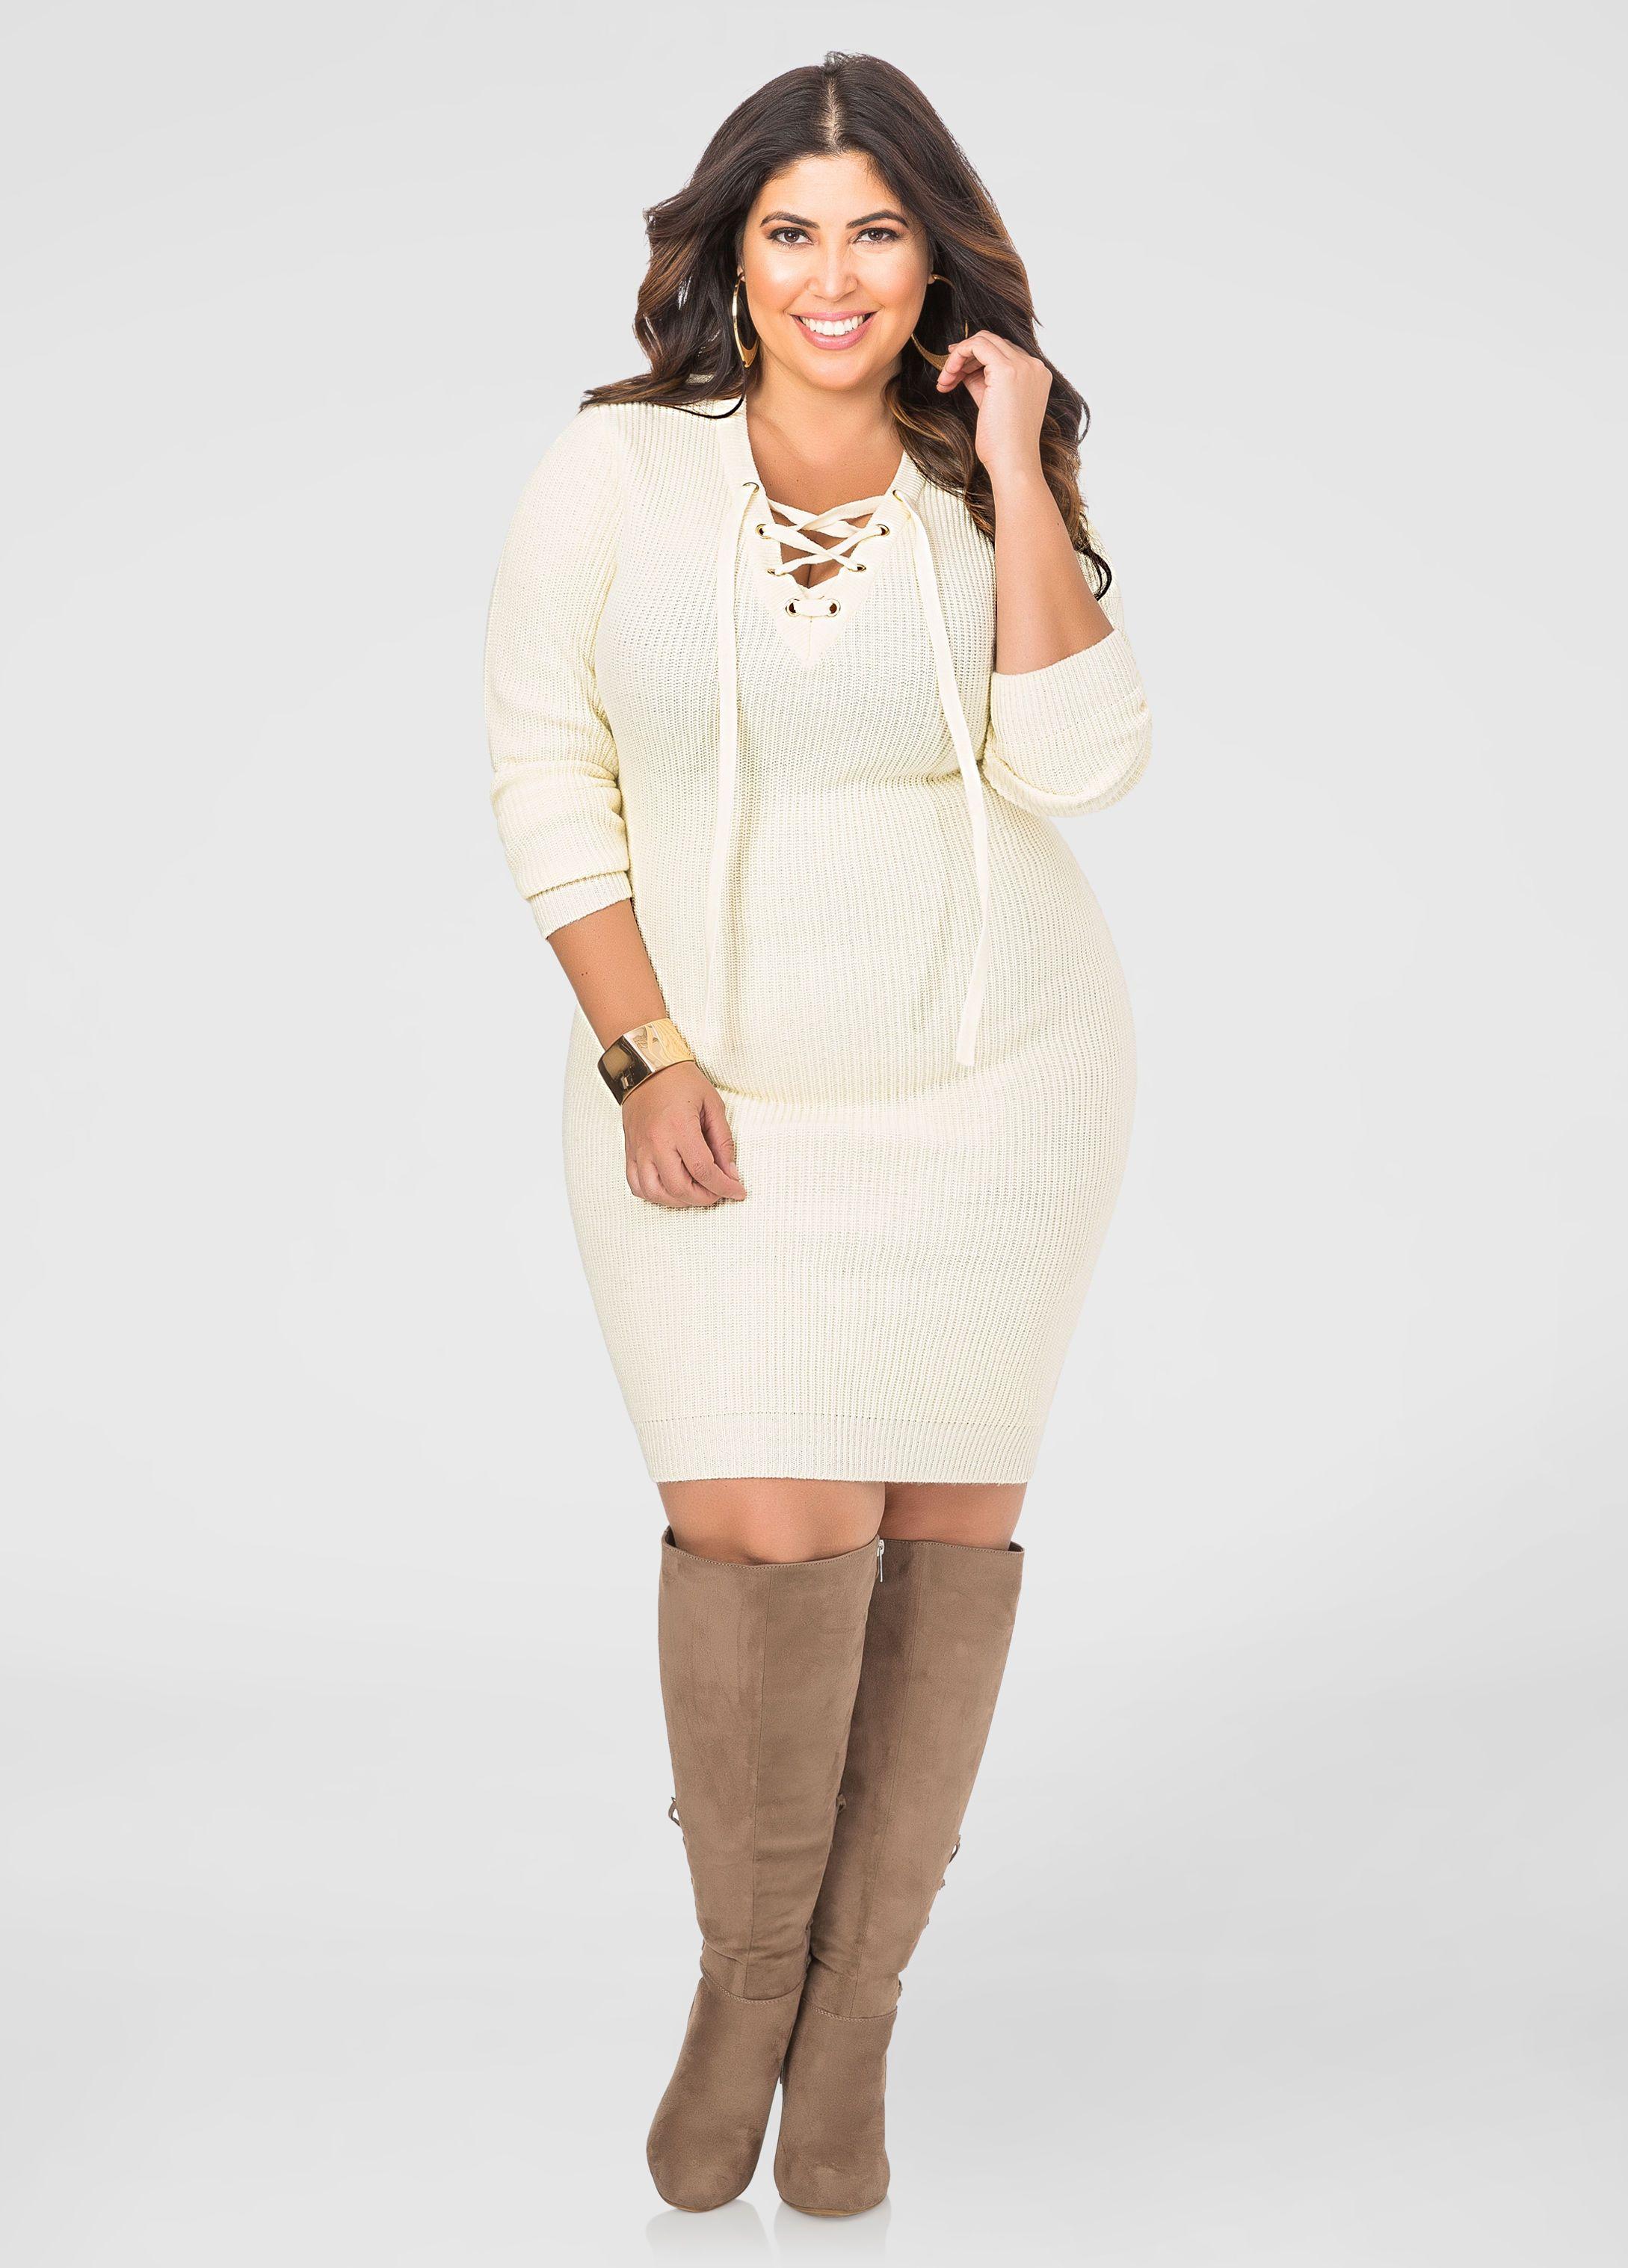 7a1ac1aaf8 Lace-Up Bodycon Sweater Dress - Ashley Stewart